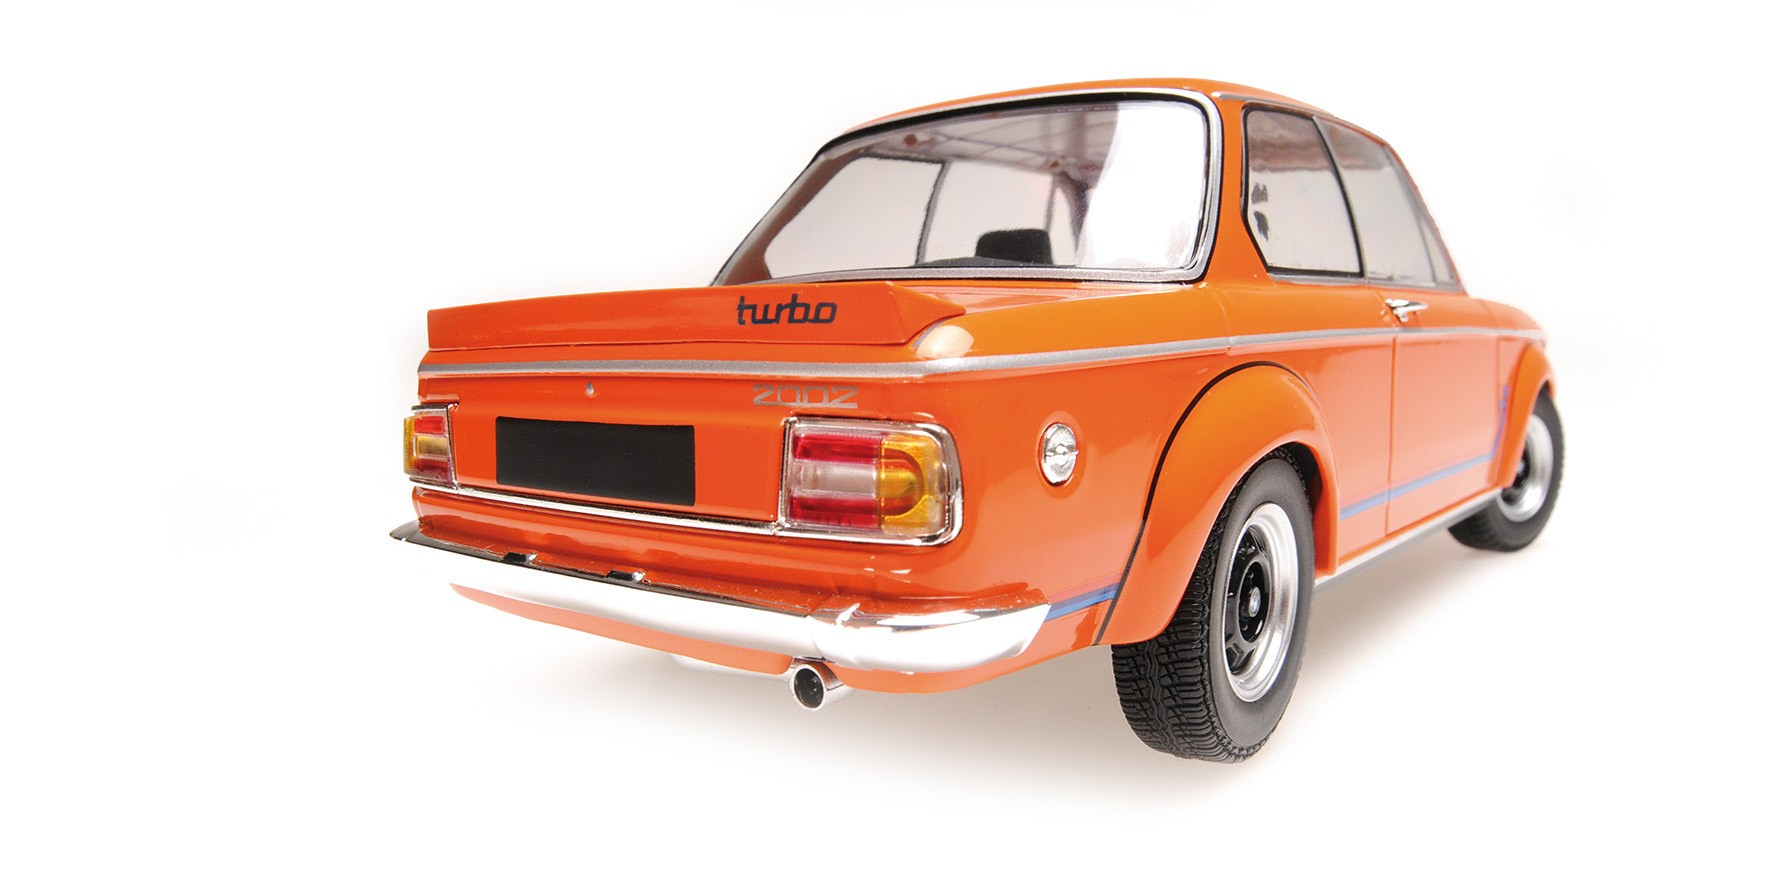 Bmw 2002 Turbo 1973 Orange Minichamps 155026202 Miniatures Minichamps